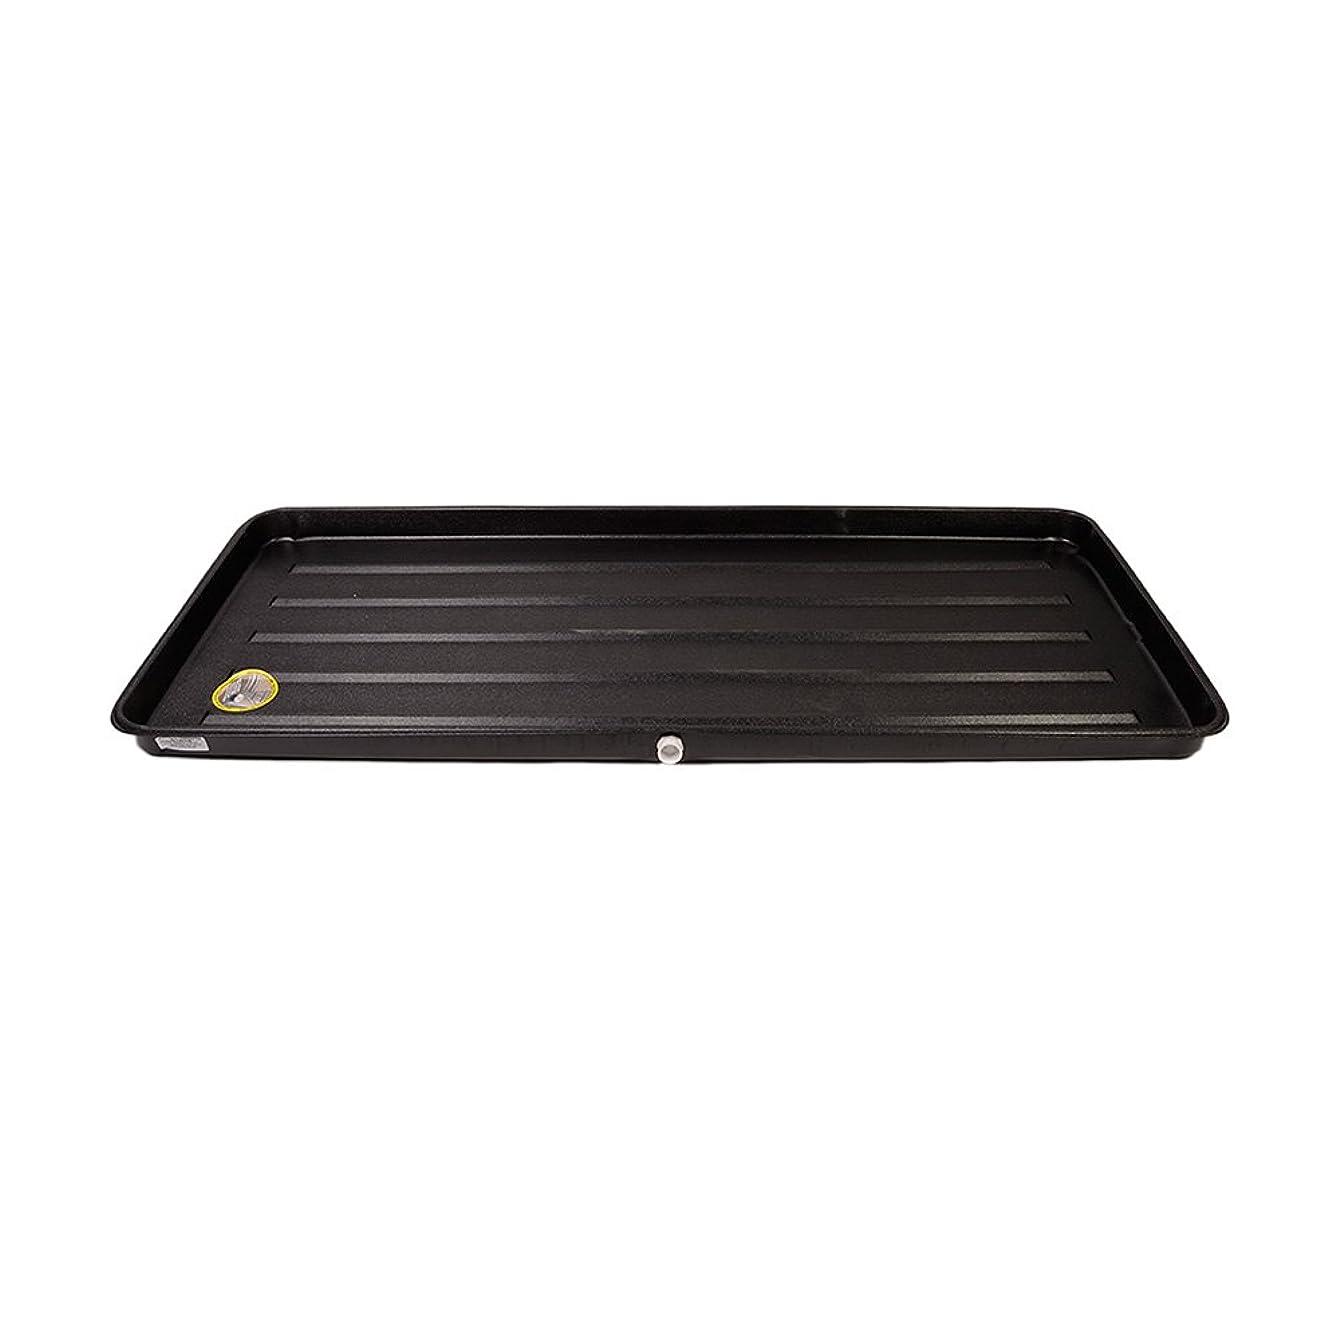 DiversiTech 6-2763L A/C Secondary Condensate Drain Pan, Outlet Long Side, Bottom 27